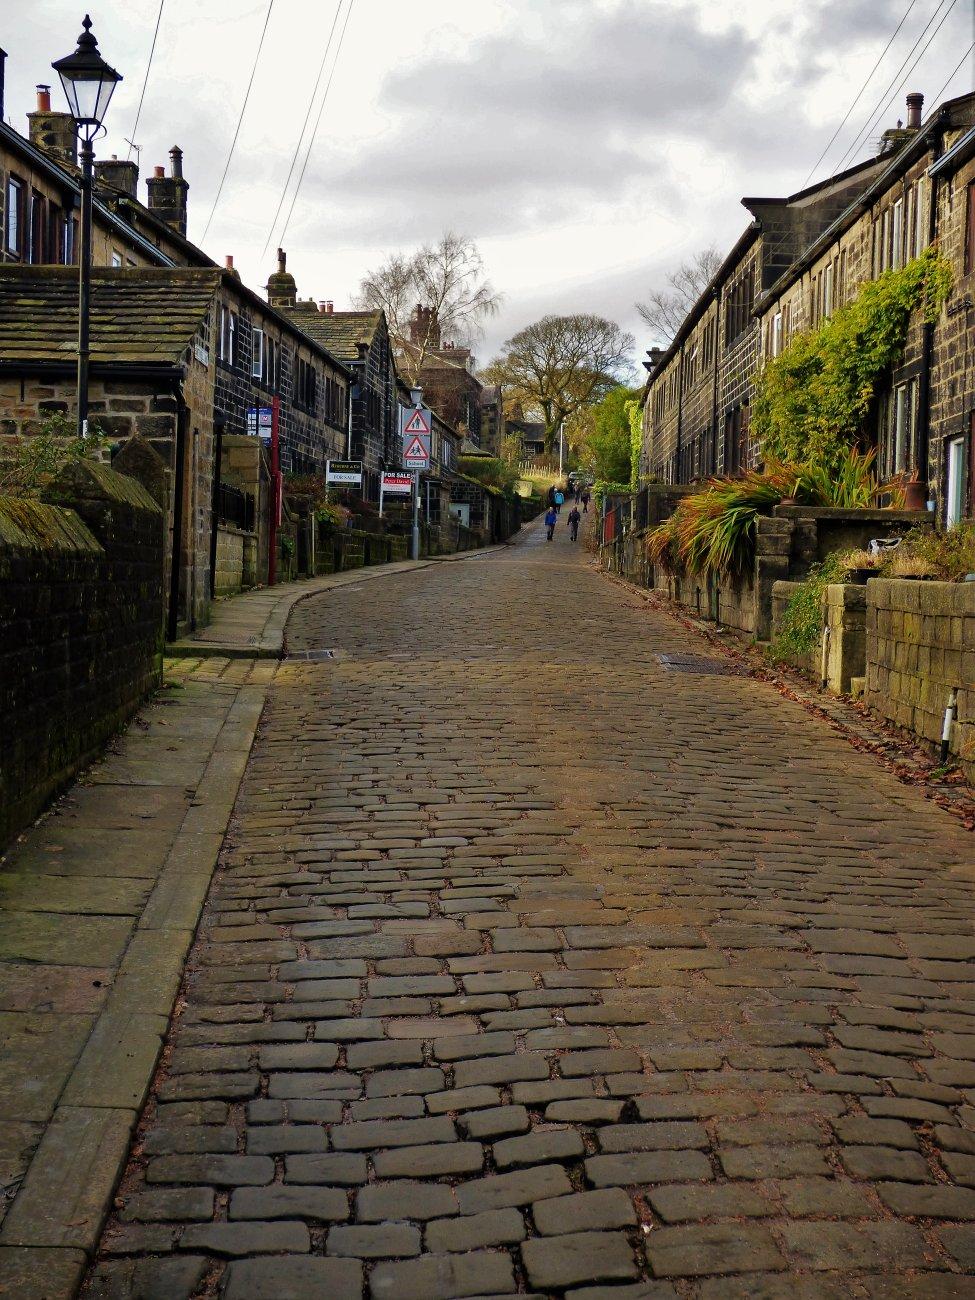 Heptonstall village